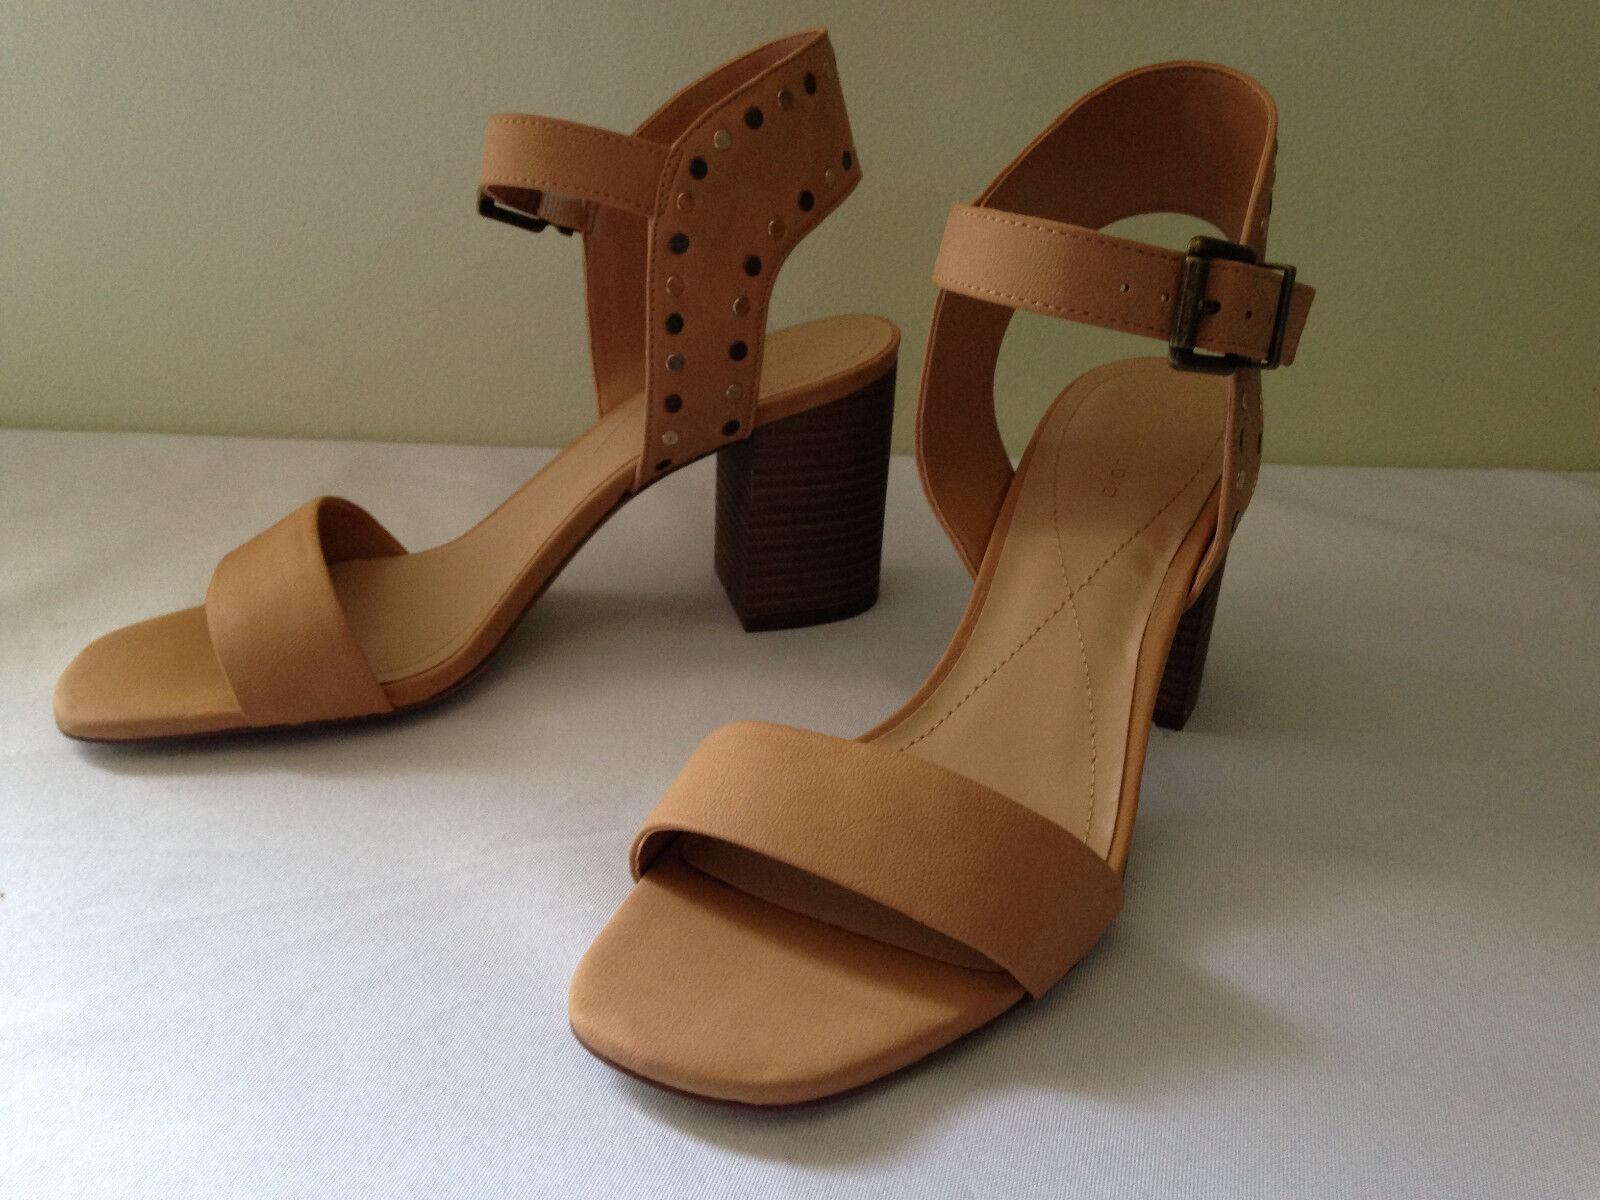 NEW Max Studio Beige Studded Vegan Leather SIRENTY Heels Sexy Sandals 9.5 M  118